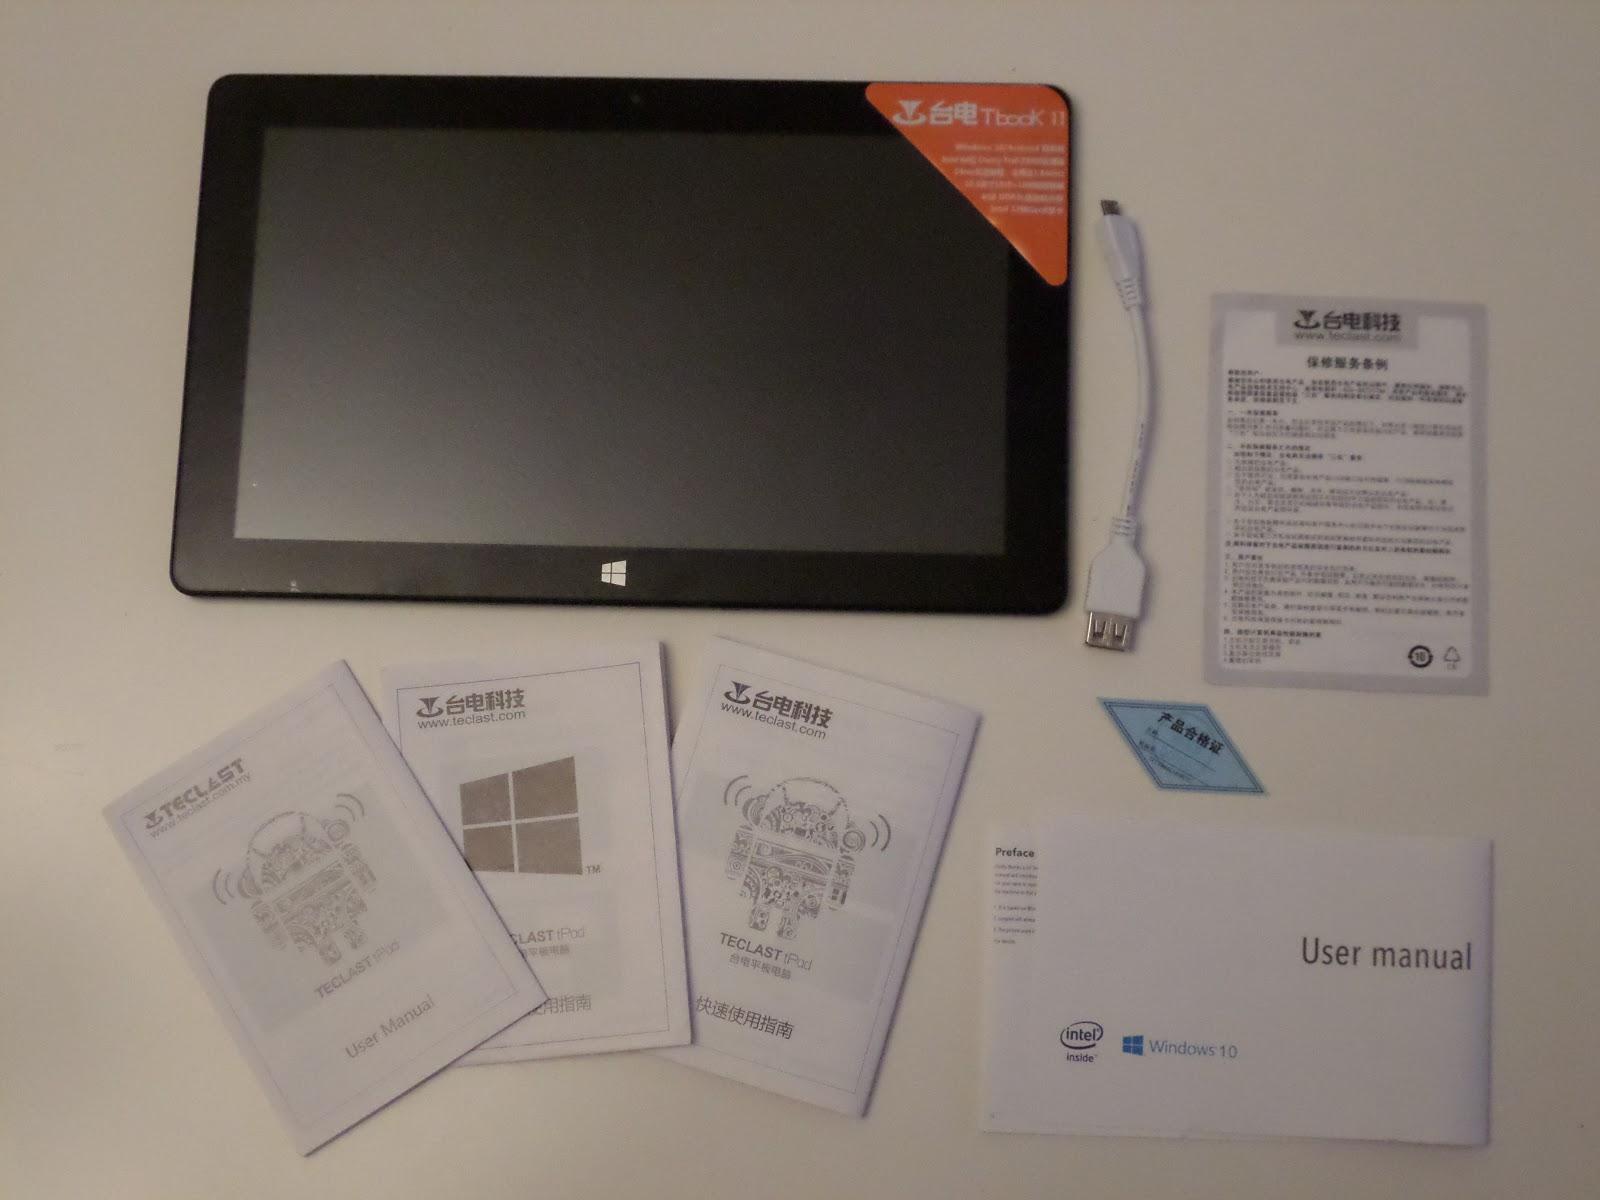 paquete Teclast Tbook 11